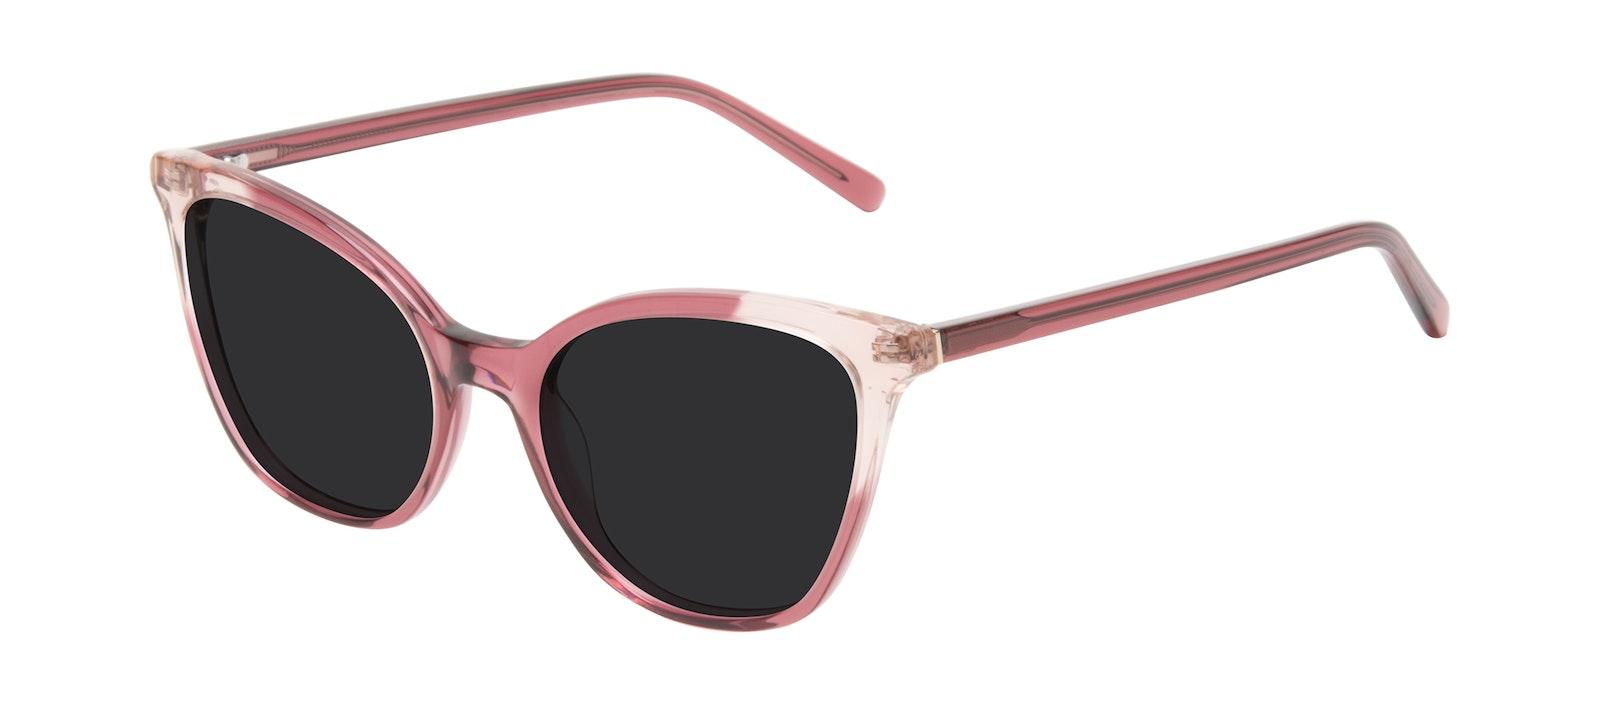 Affordable Fashion Glasses Cat Eye Sunglasses Women Tippi Orchid Pink Tilt